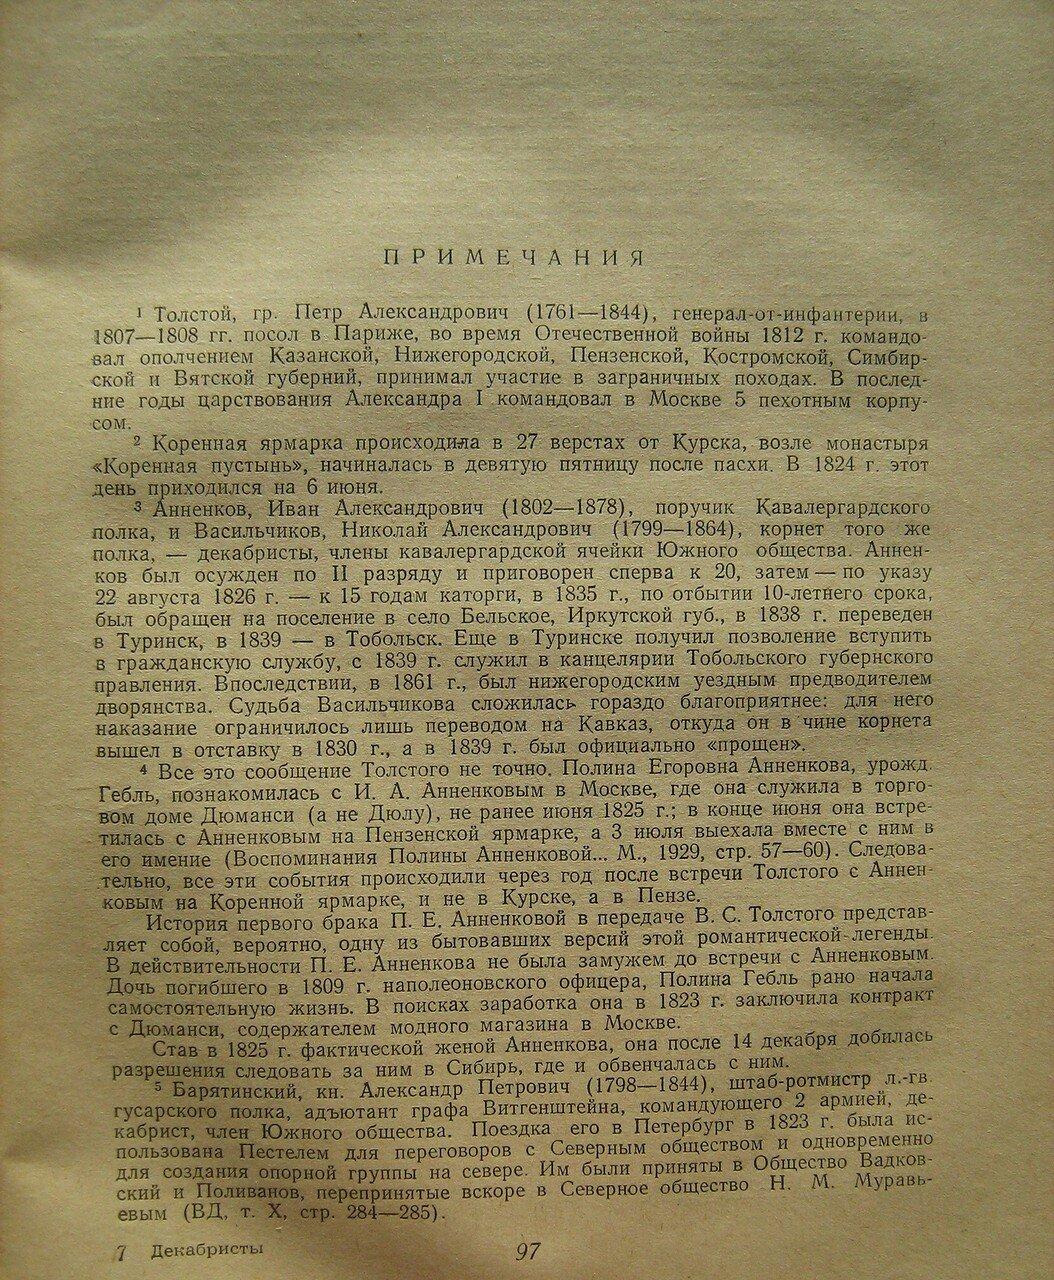 https://img-fotki.yandex.ru/get/373630/199368979.de/0_21f74f_dacd3c5b_XXXL.jpg